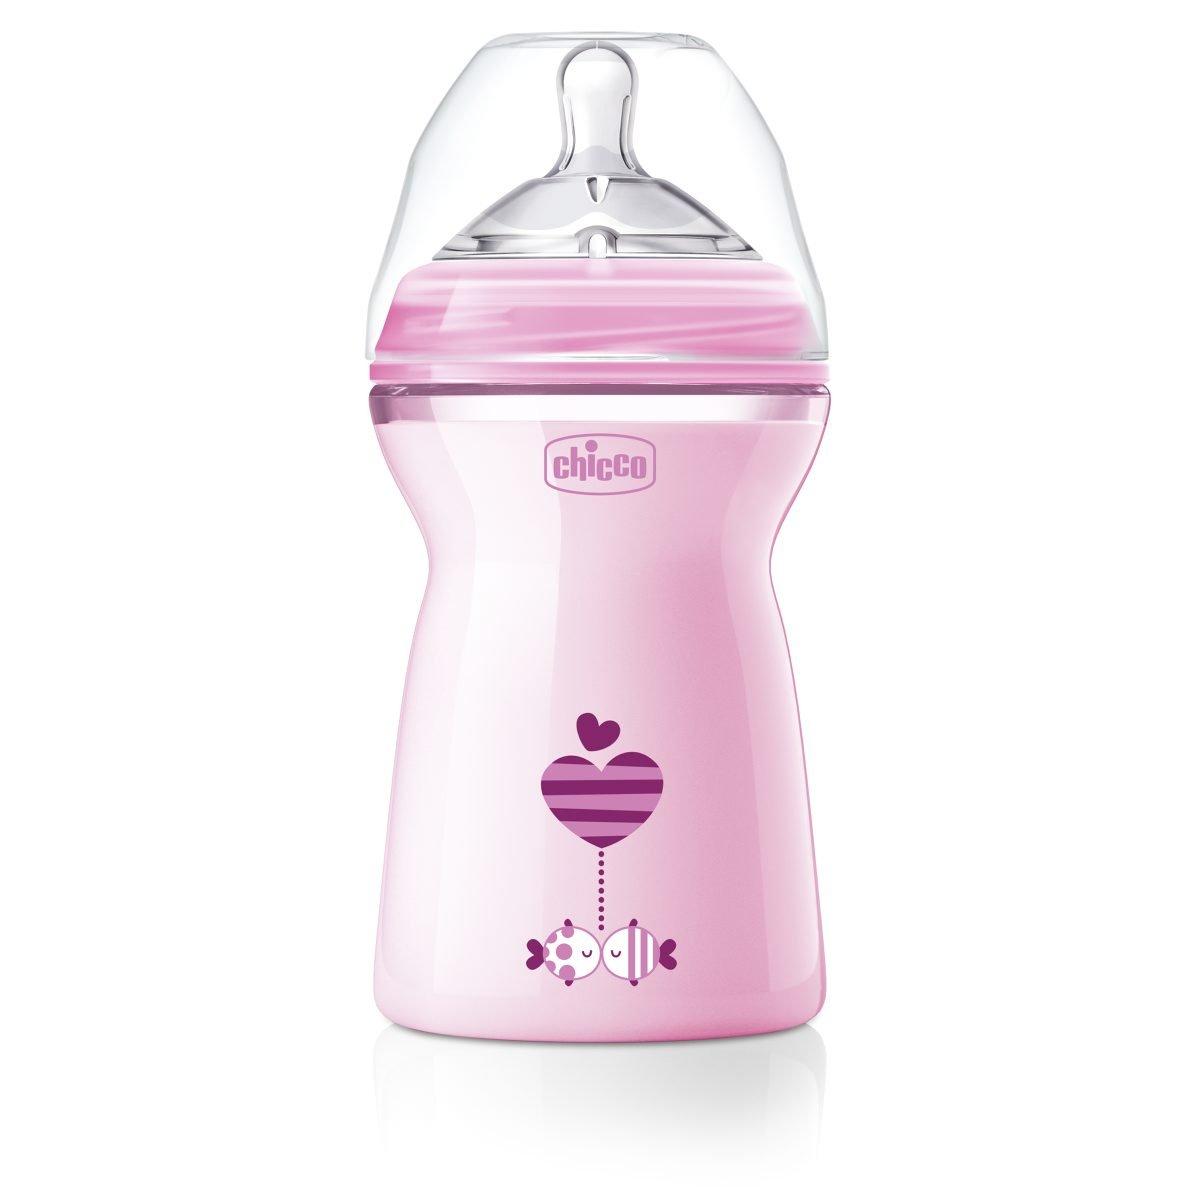 rosa flujo r/ápido 330 ml Chicco NaturalFeeling Biber/ón con tetina especial para lactancia mixta 6 m+